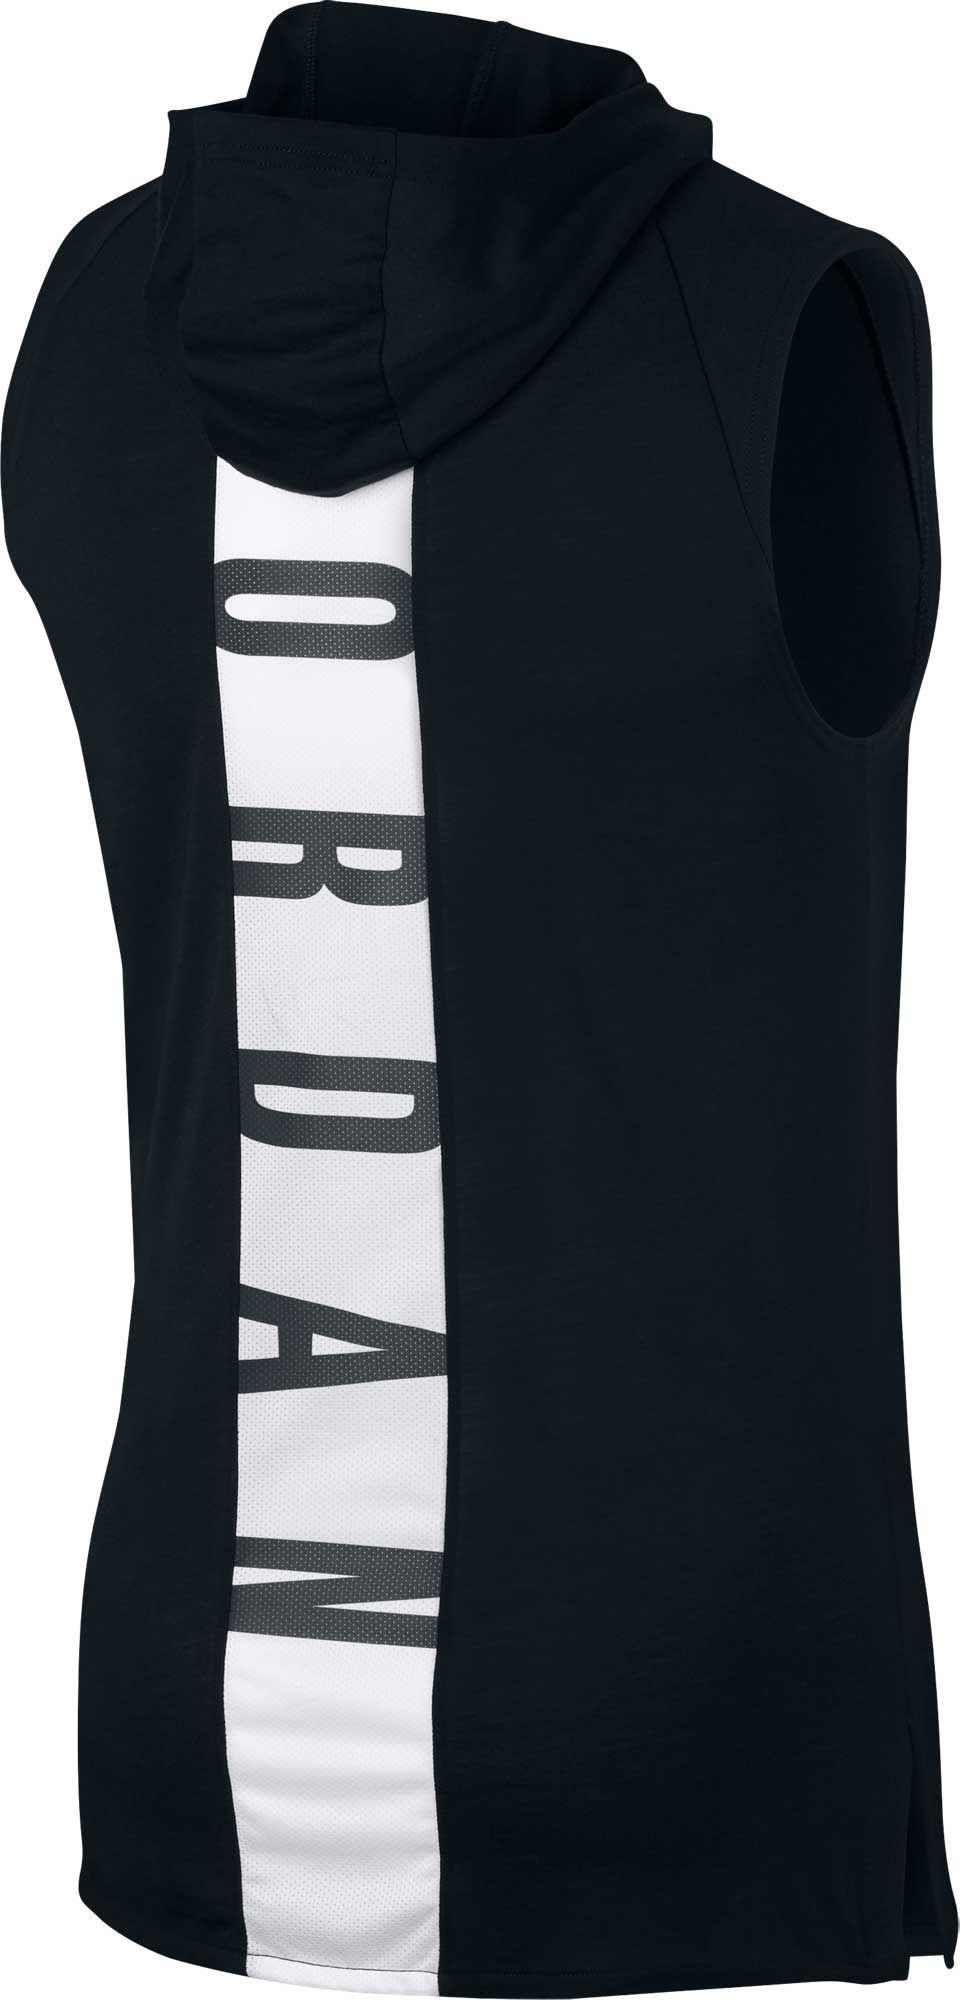 c2ef6f8f1ef Nike Jordan Dry 23 Alpha Hooded Sleeveless Tank Top in Black for Men ...